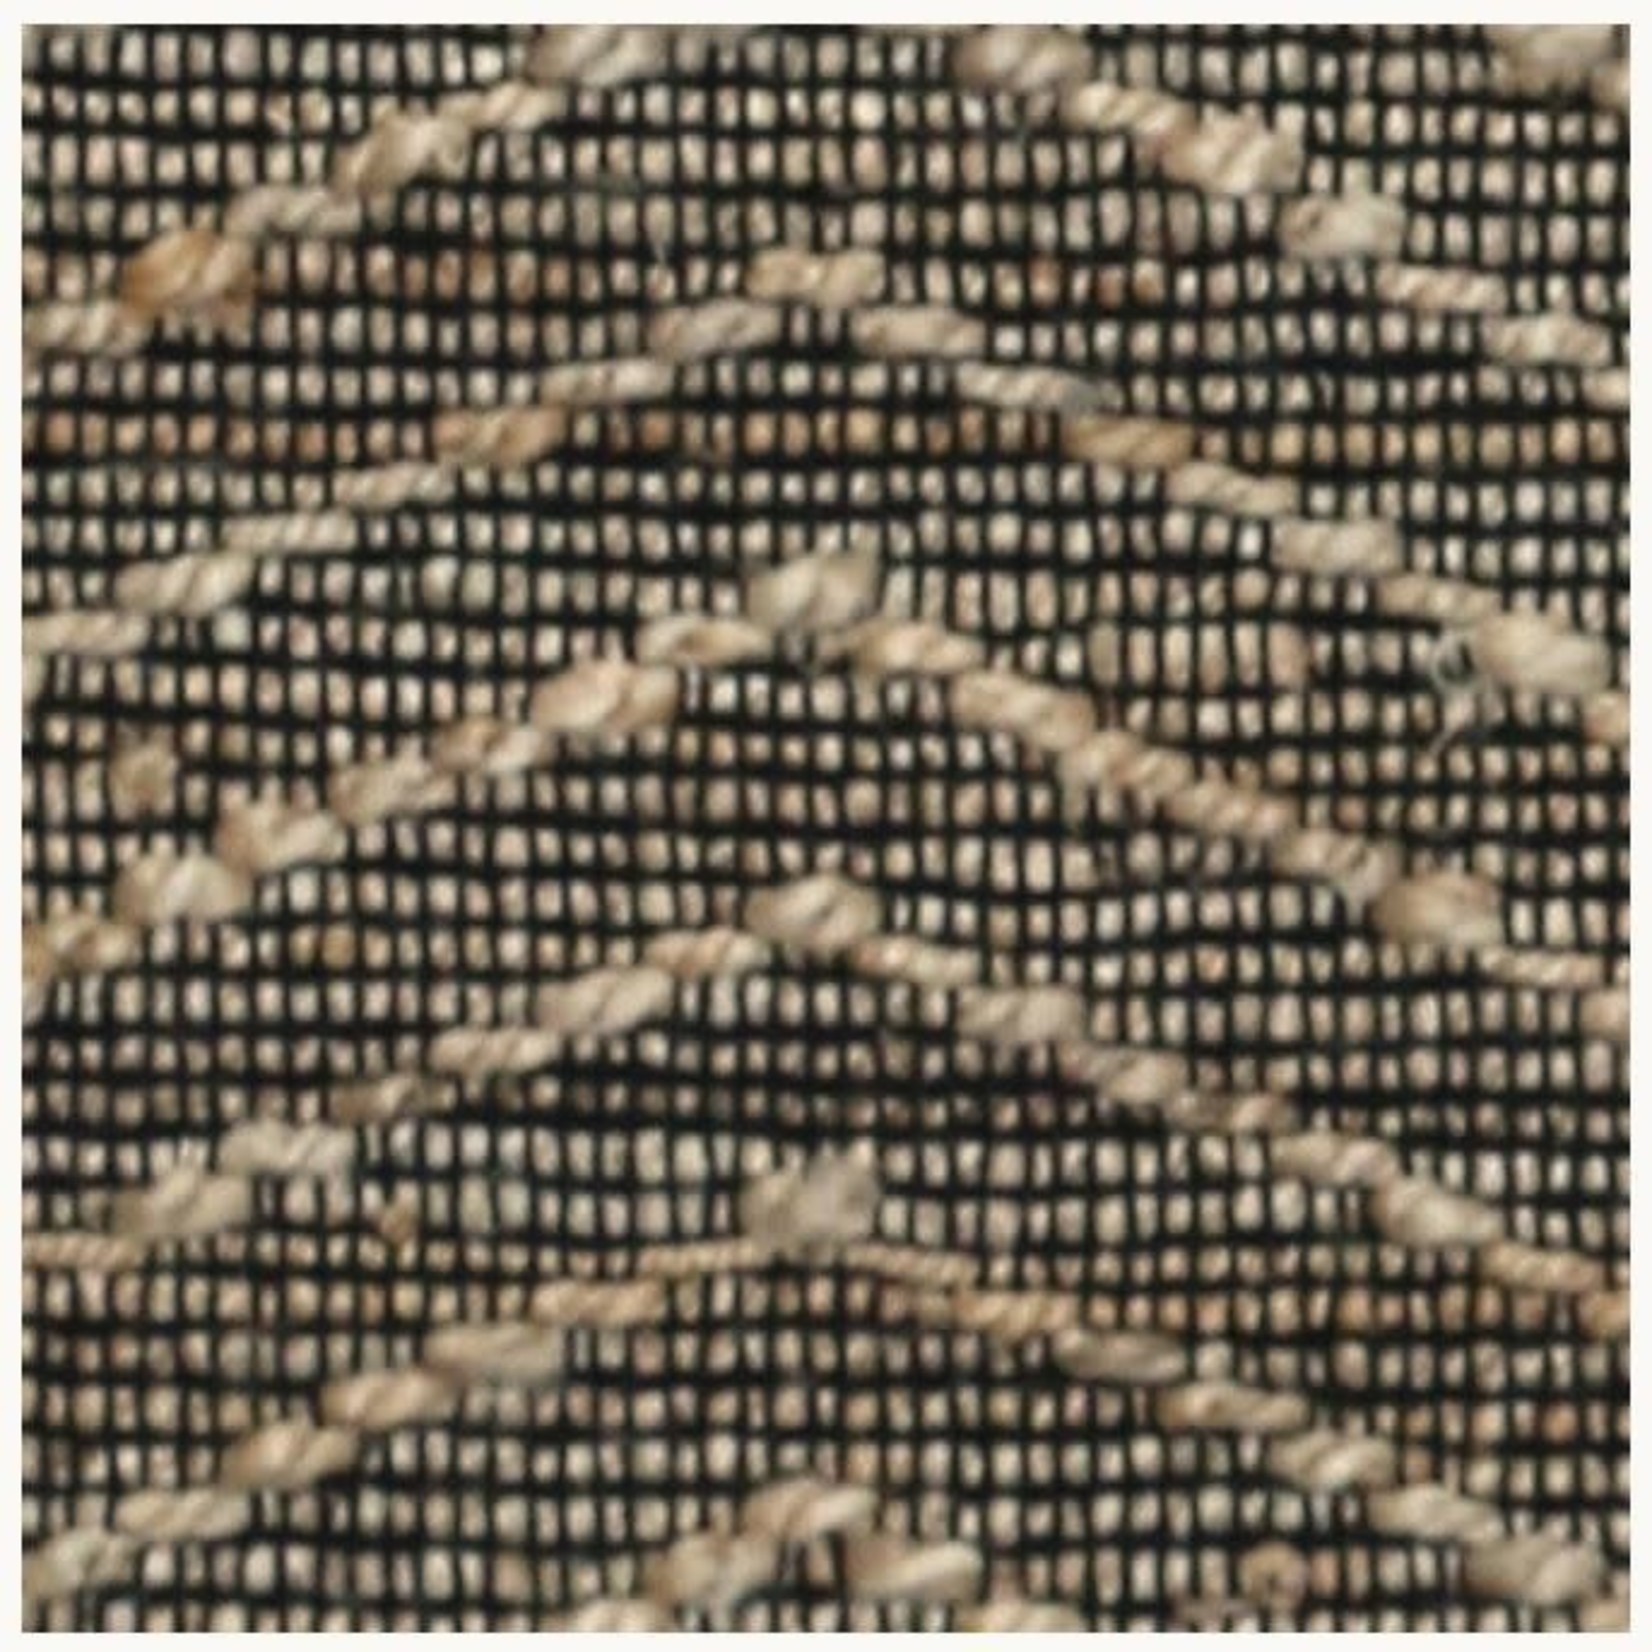 CC Interiors Black & Natural Zig Zag Jute & Cotton Rug